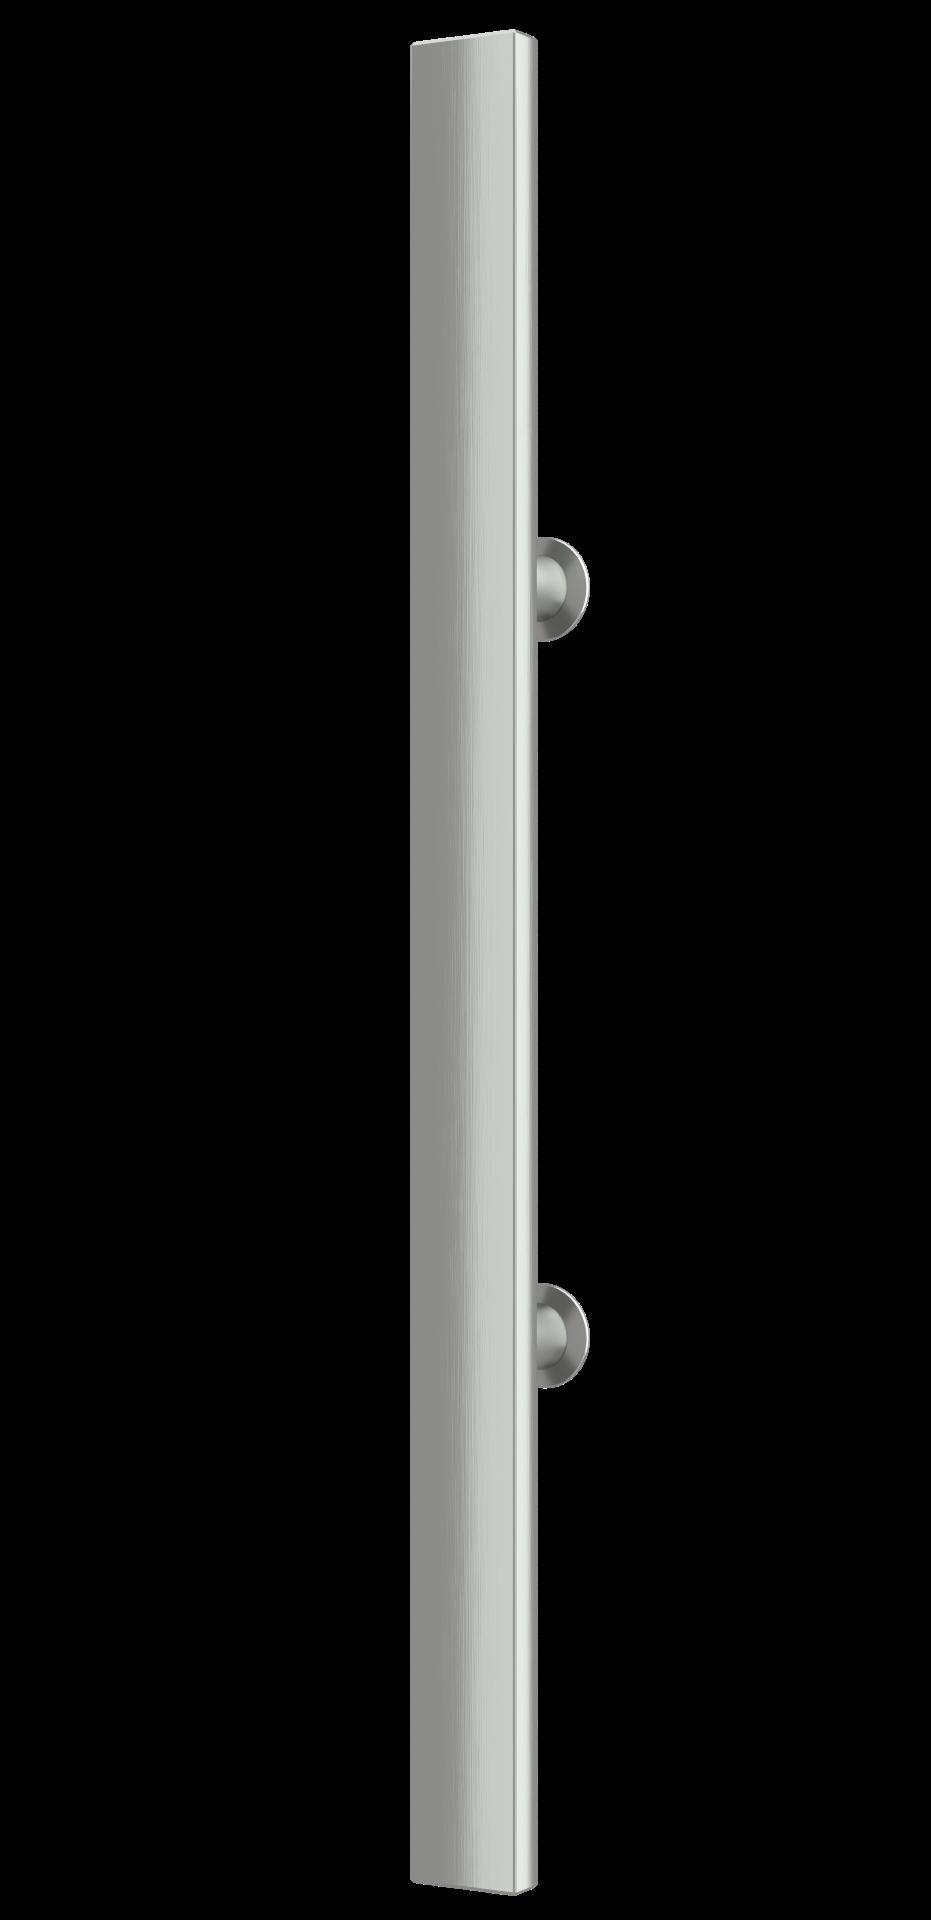 Griffingov ročaj GRP-ON-90-PRA iz linije Prime Line-inox ročaji za vhodna vrata